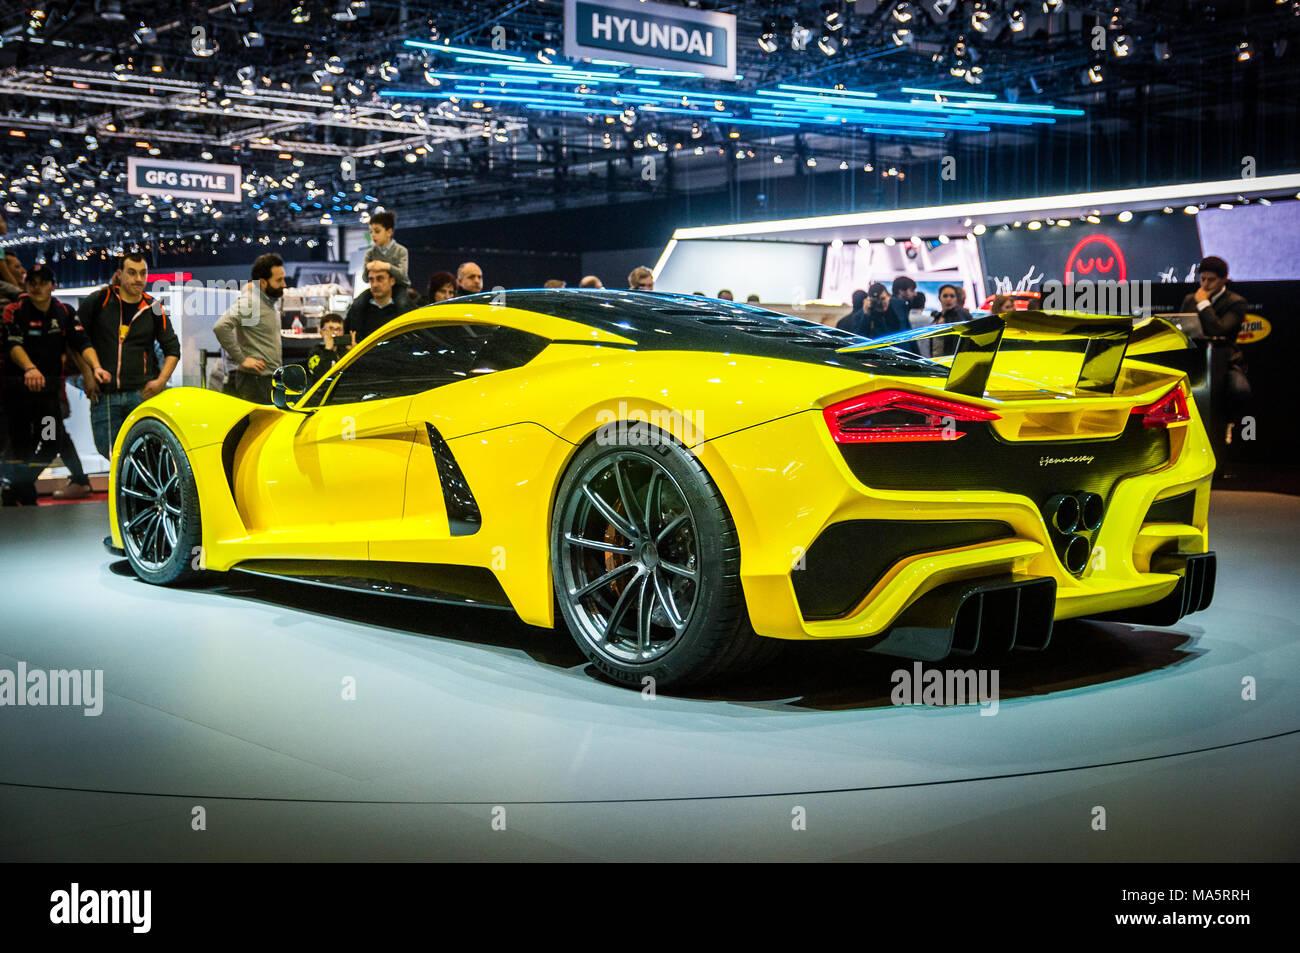 GENEVA, SWITZERLAND - MARCH 17, 2018: Hennessey Venom F5 Superfast sports car presented at the 88th Geneva International Motor Show. Stock Photo